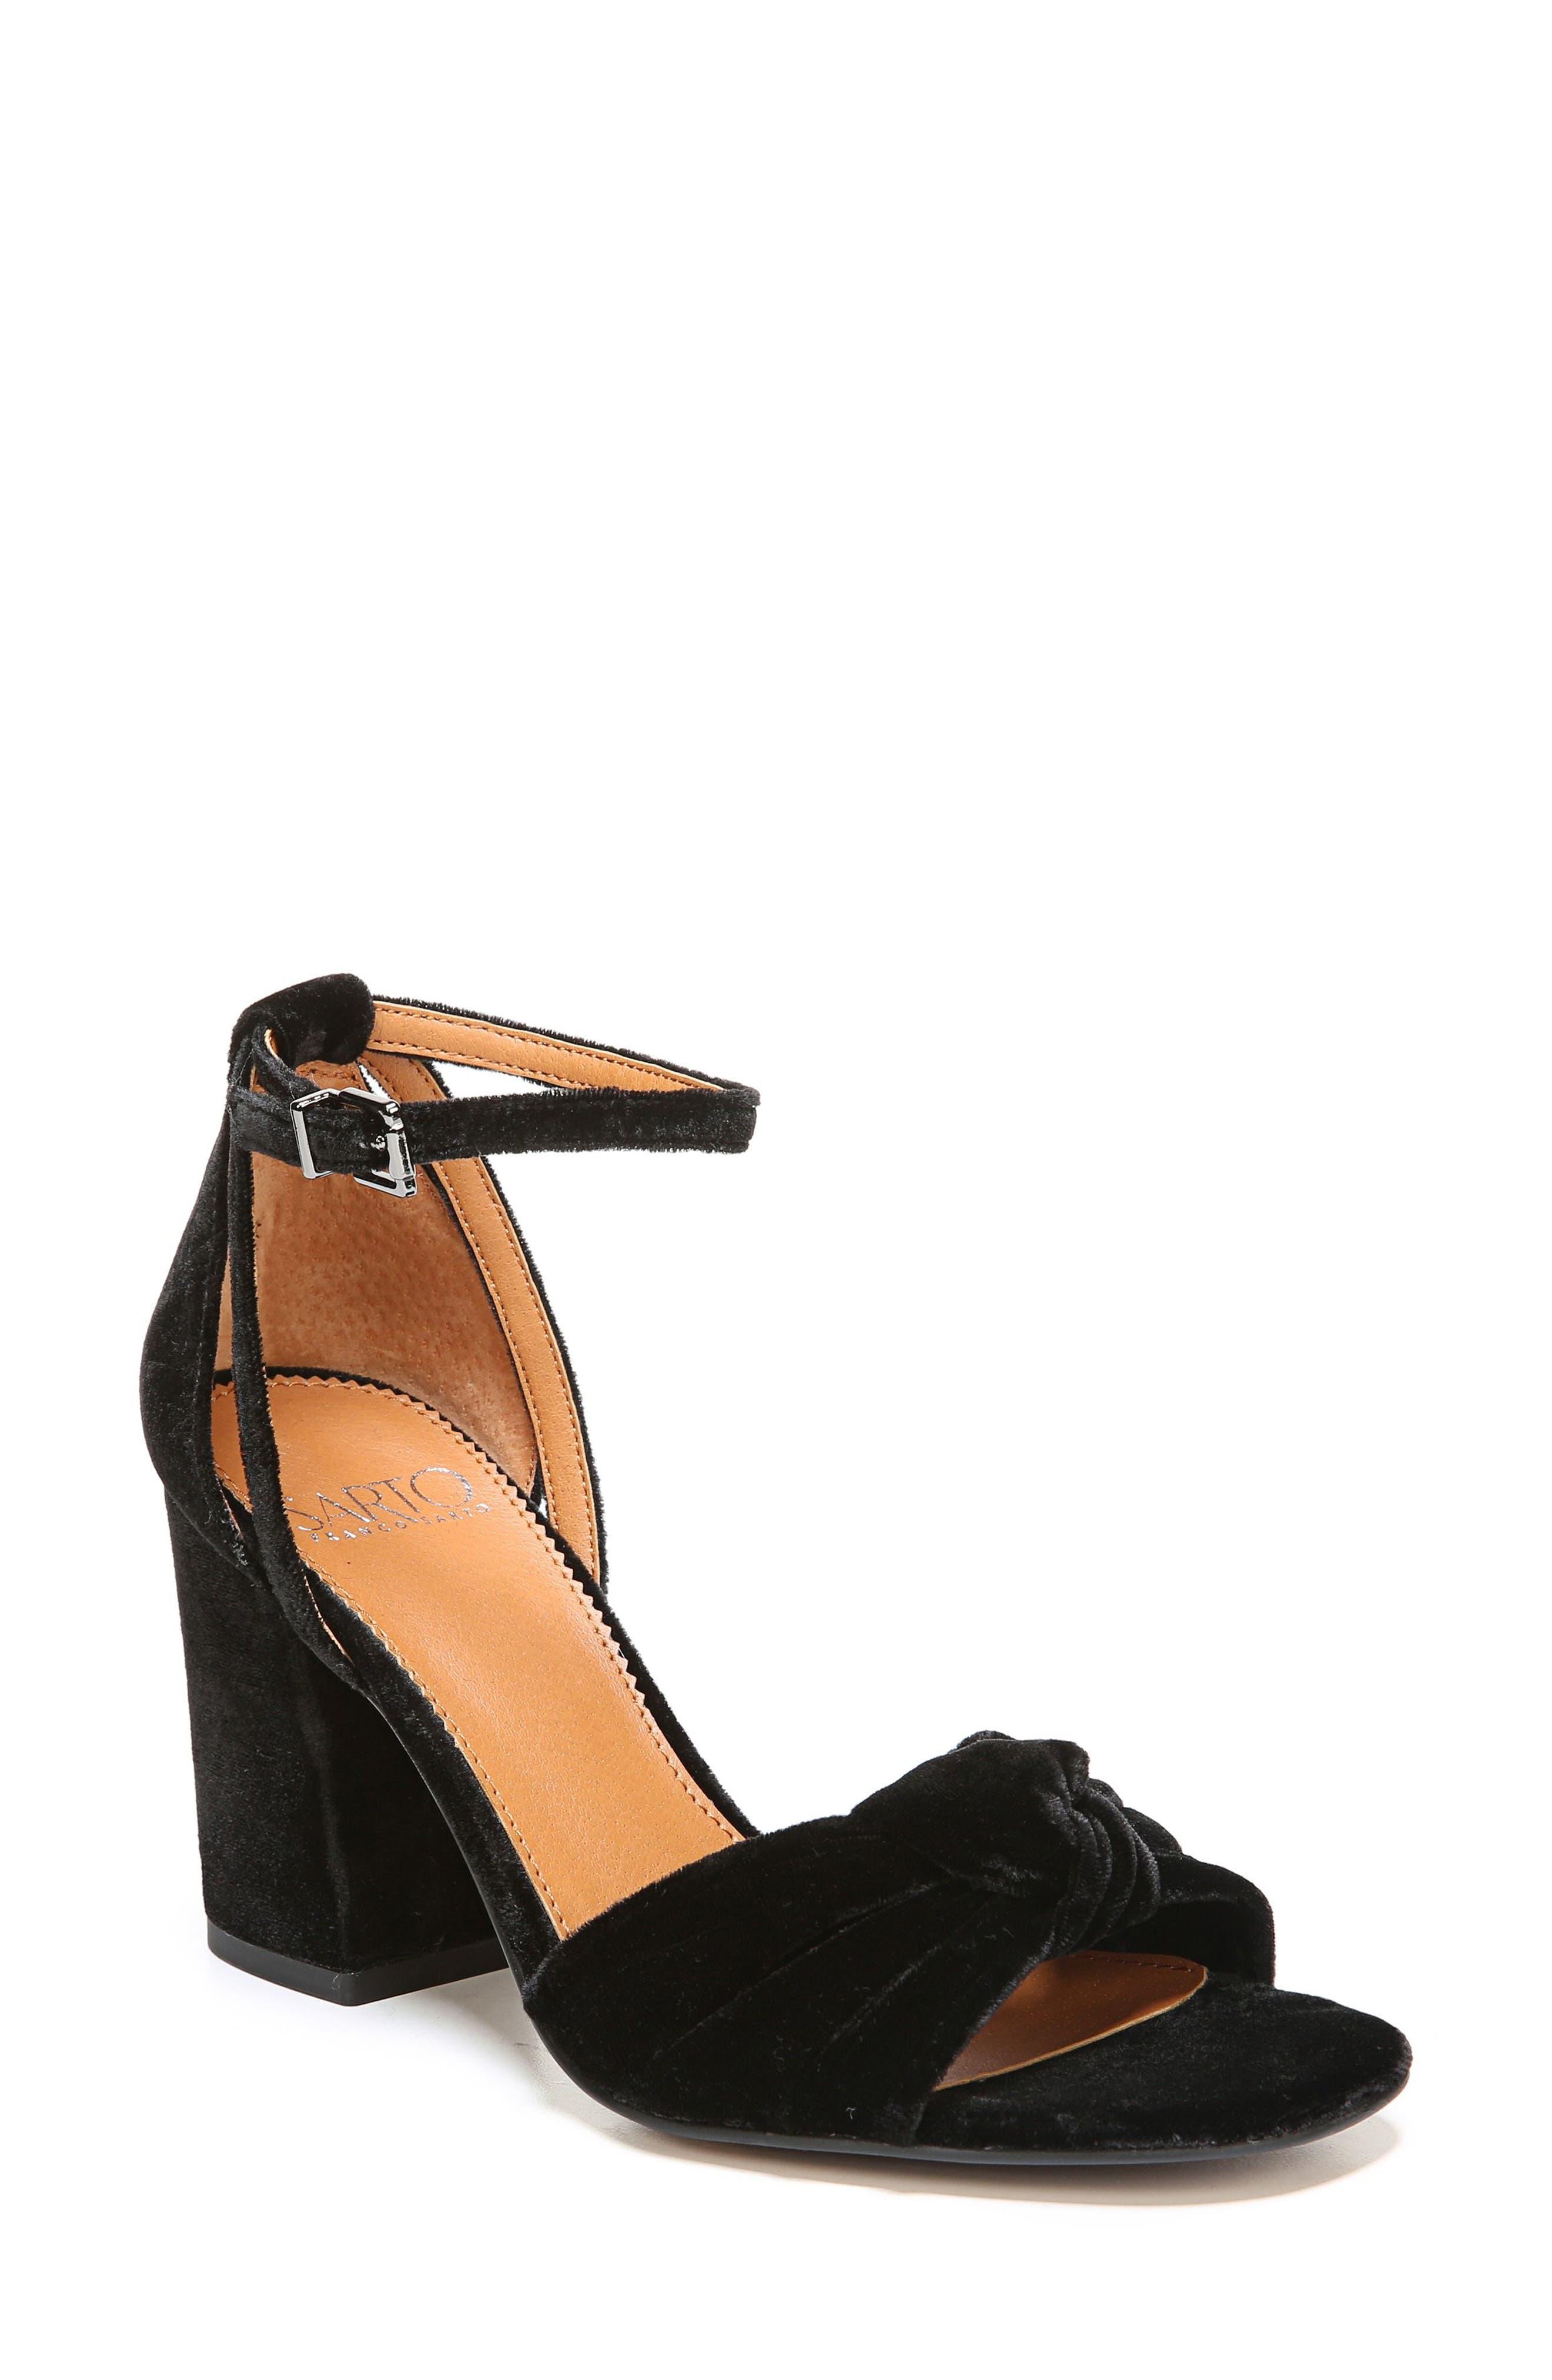 Edana Knotted Block Heel Sandal,                             Main thumbnail 1, color,                             001